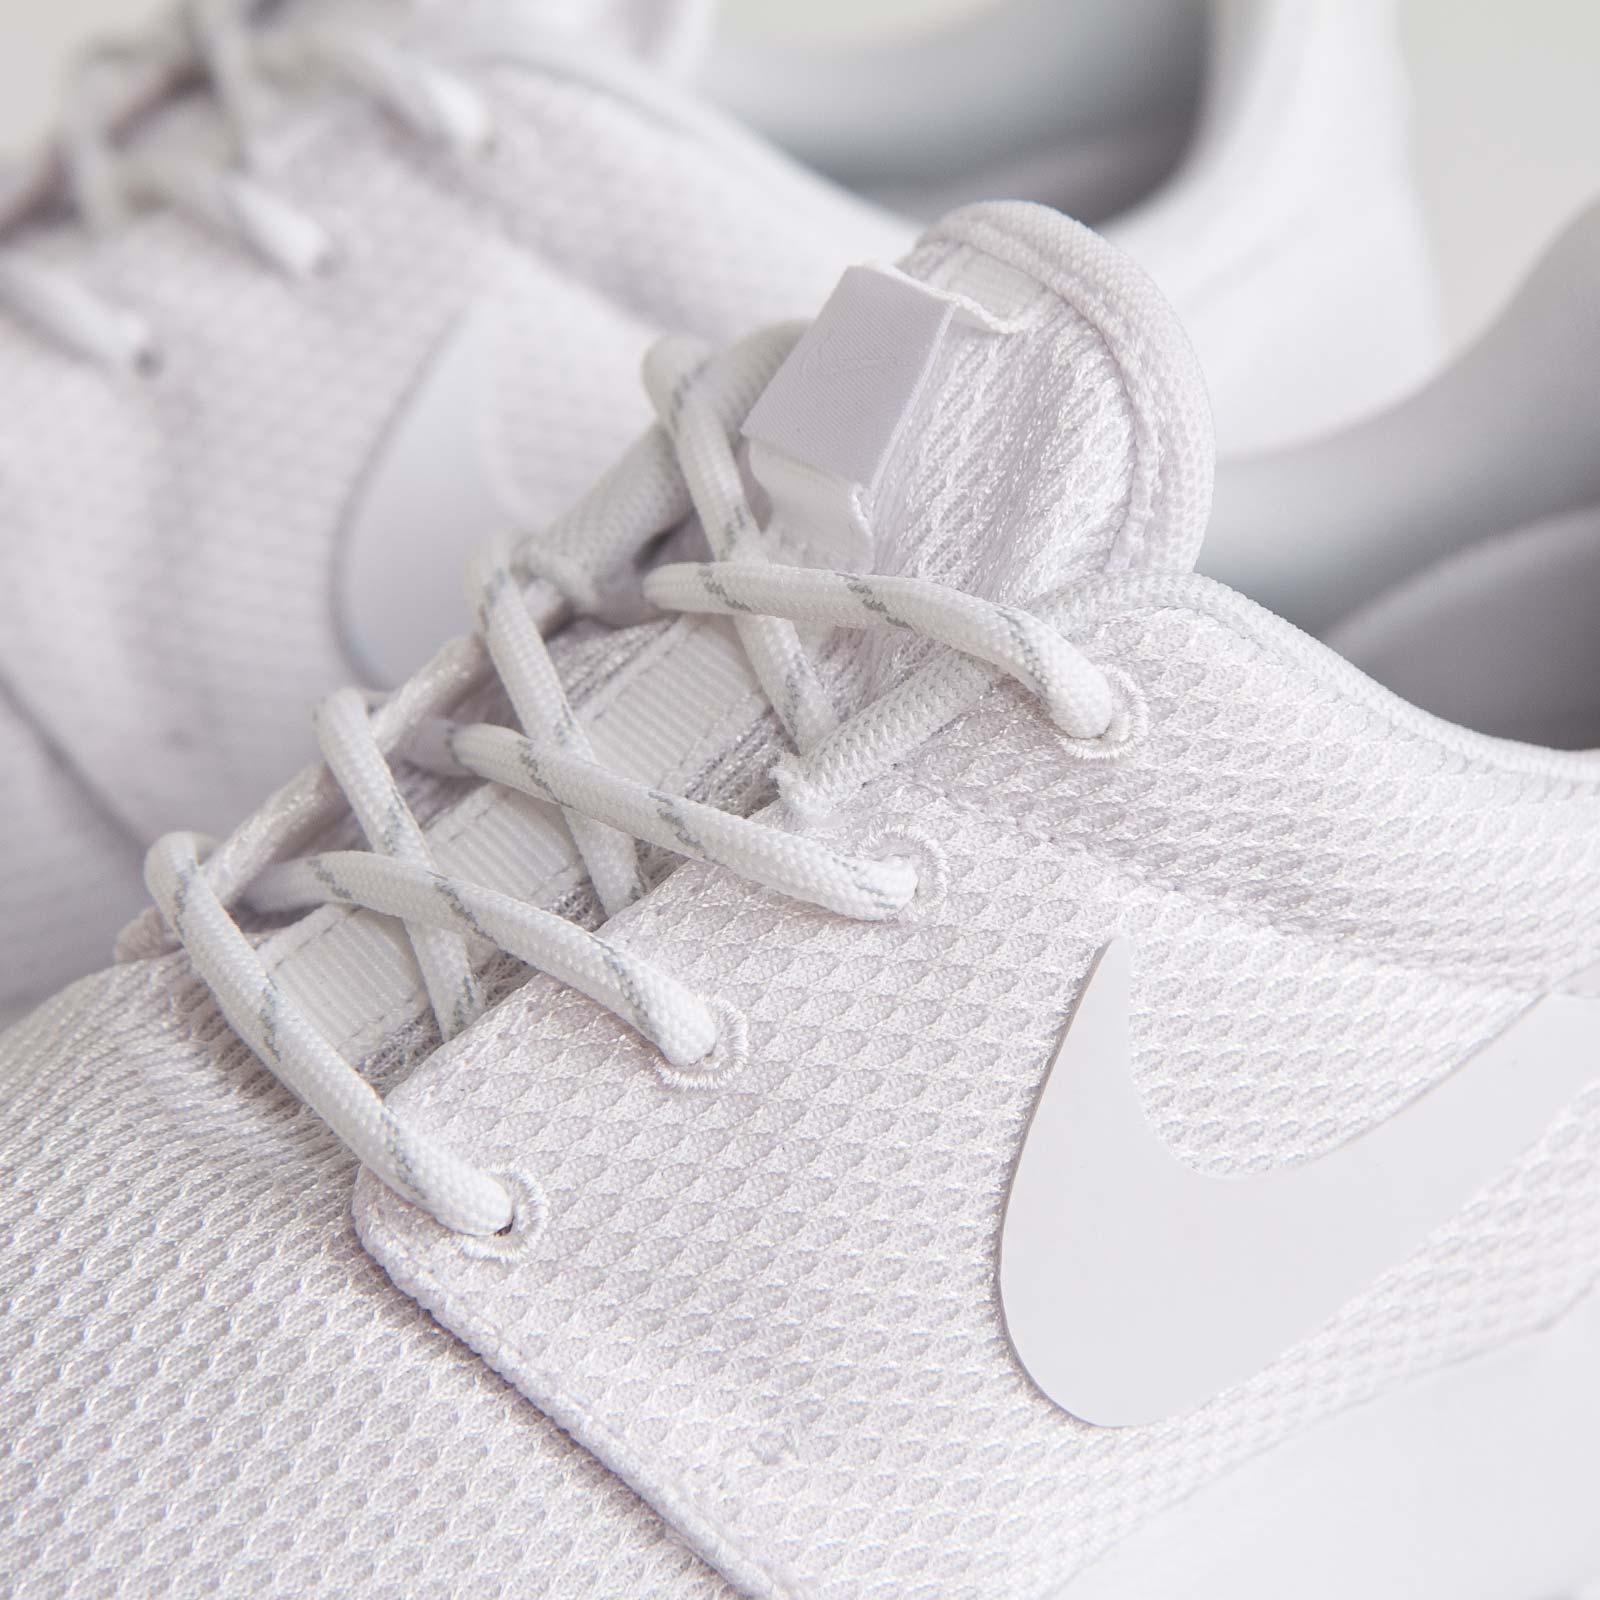 7accca2993aa Nike Wmns Roshe Run - 511882-111 - Sneakersnstuff